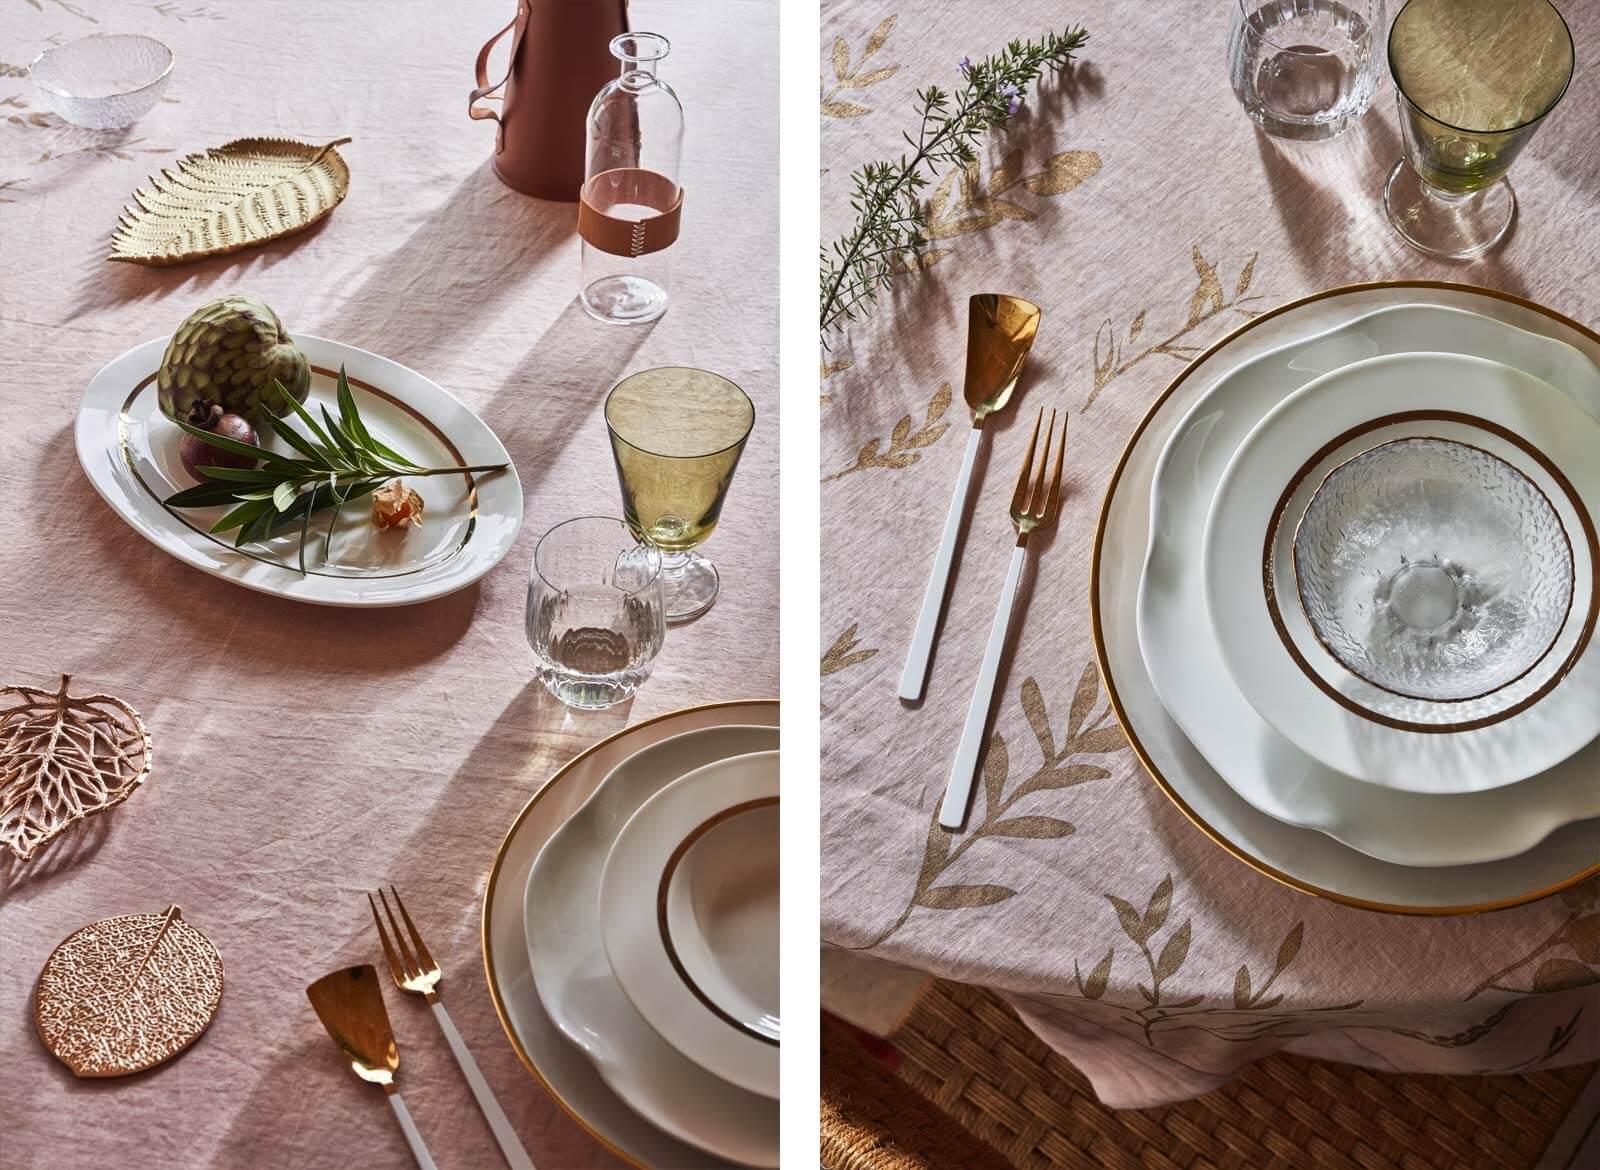 3f54e58aac5 Στη νέα συλλογή Zara Home «In Bloom» SS 2018 αναβιώνει, η ανθισμένη,  ρομαντική και floral τάση.